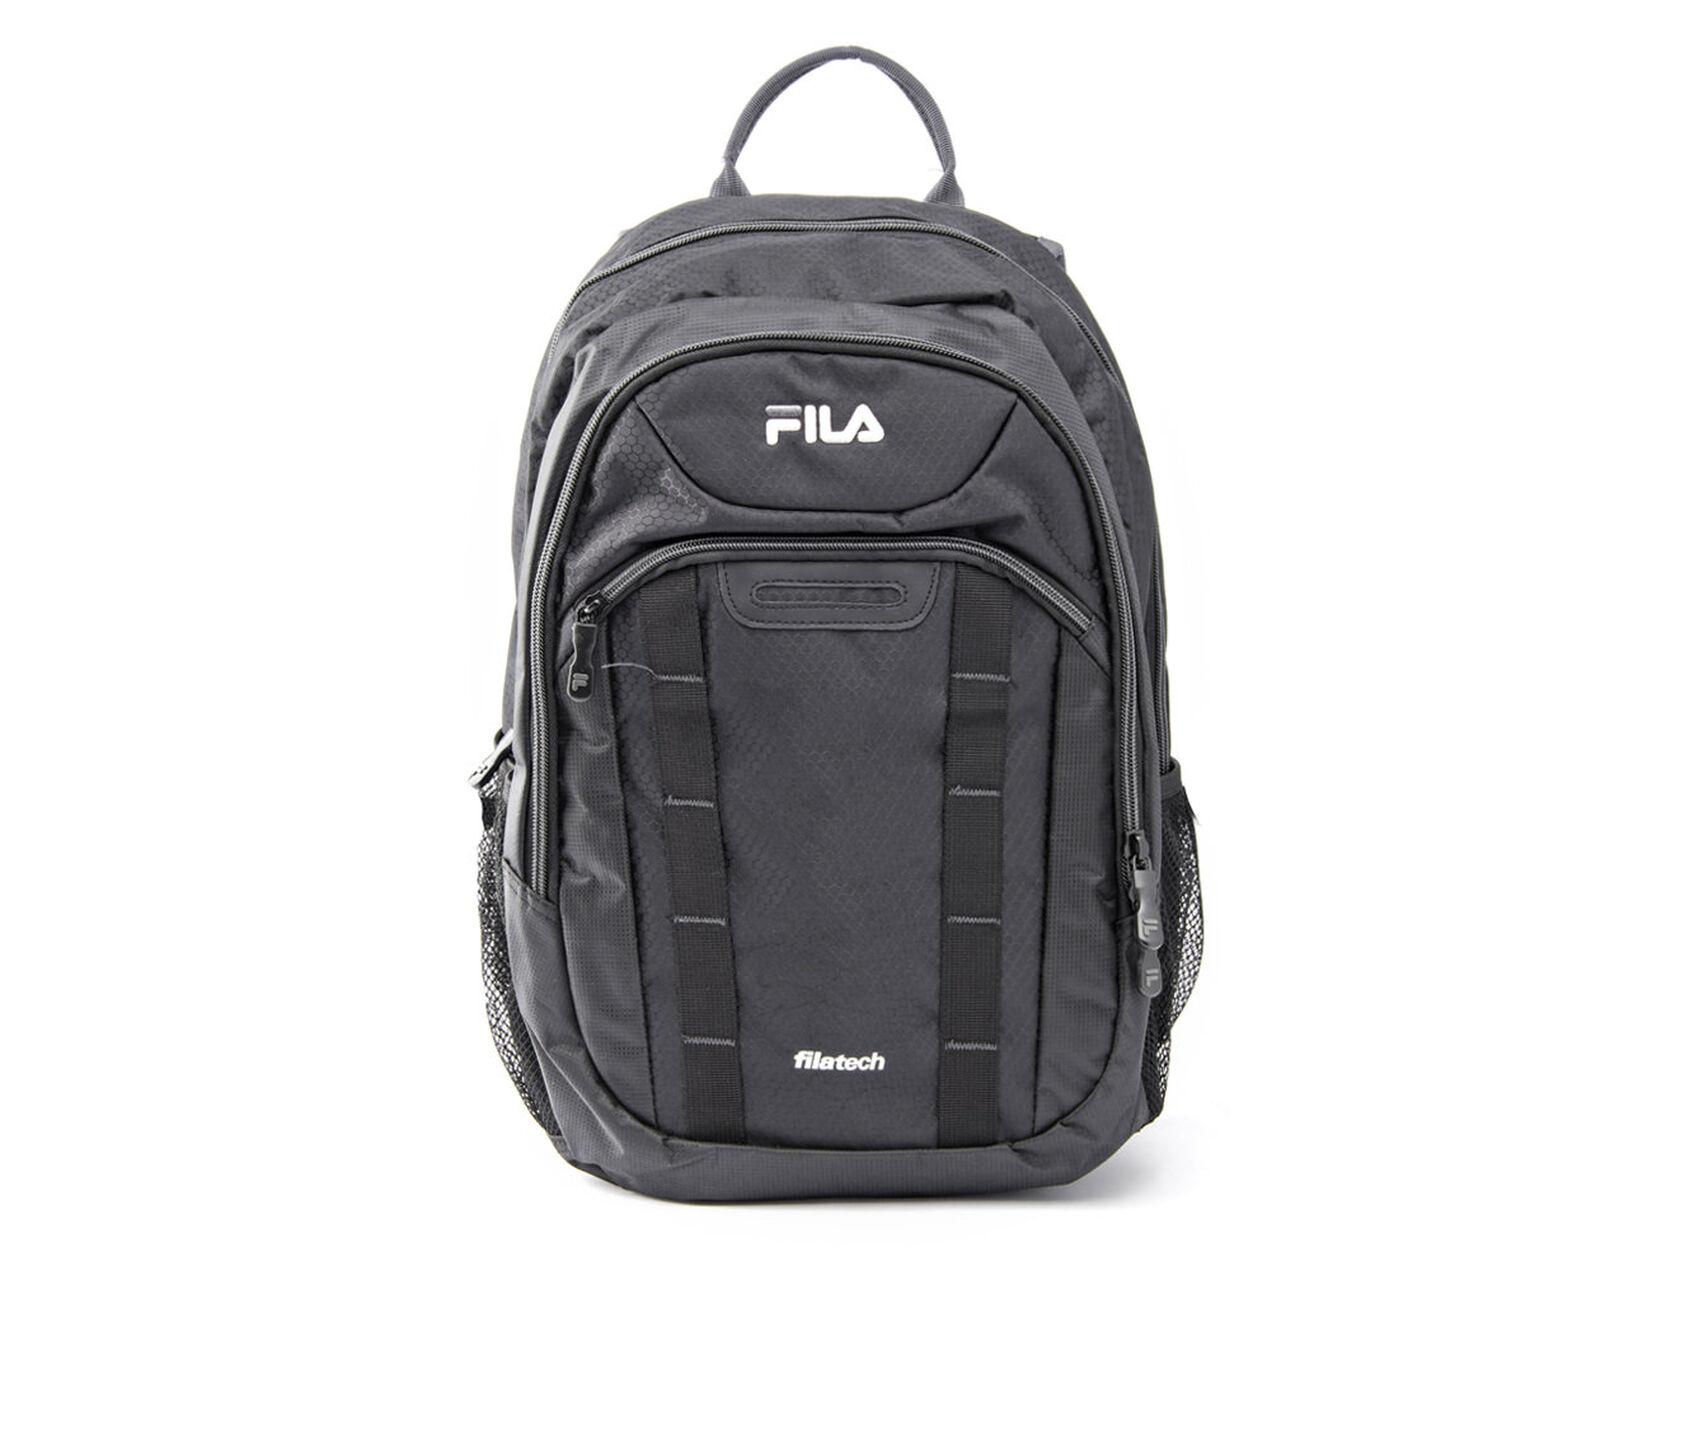 77fc8e43101 Fila Tech Sport Backpack   ReGreen Springfield